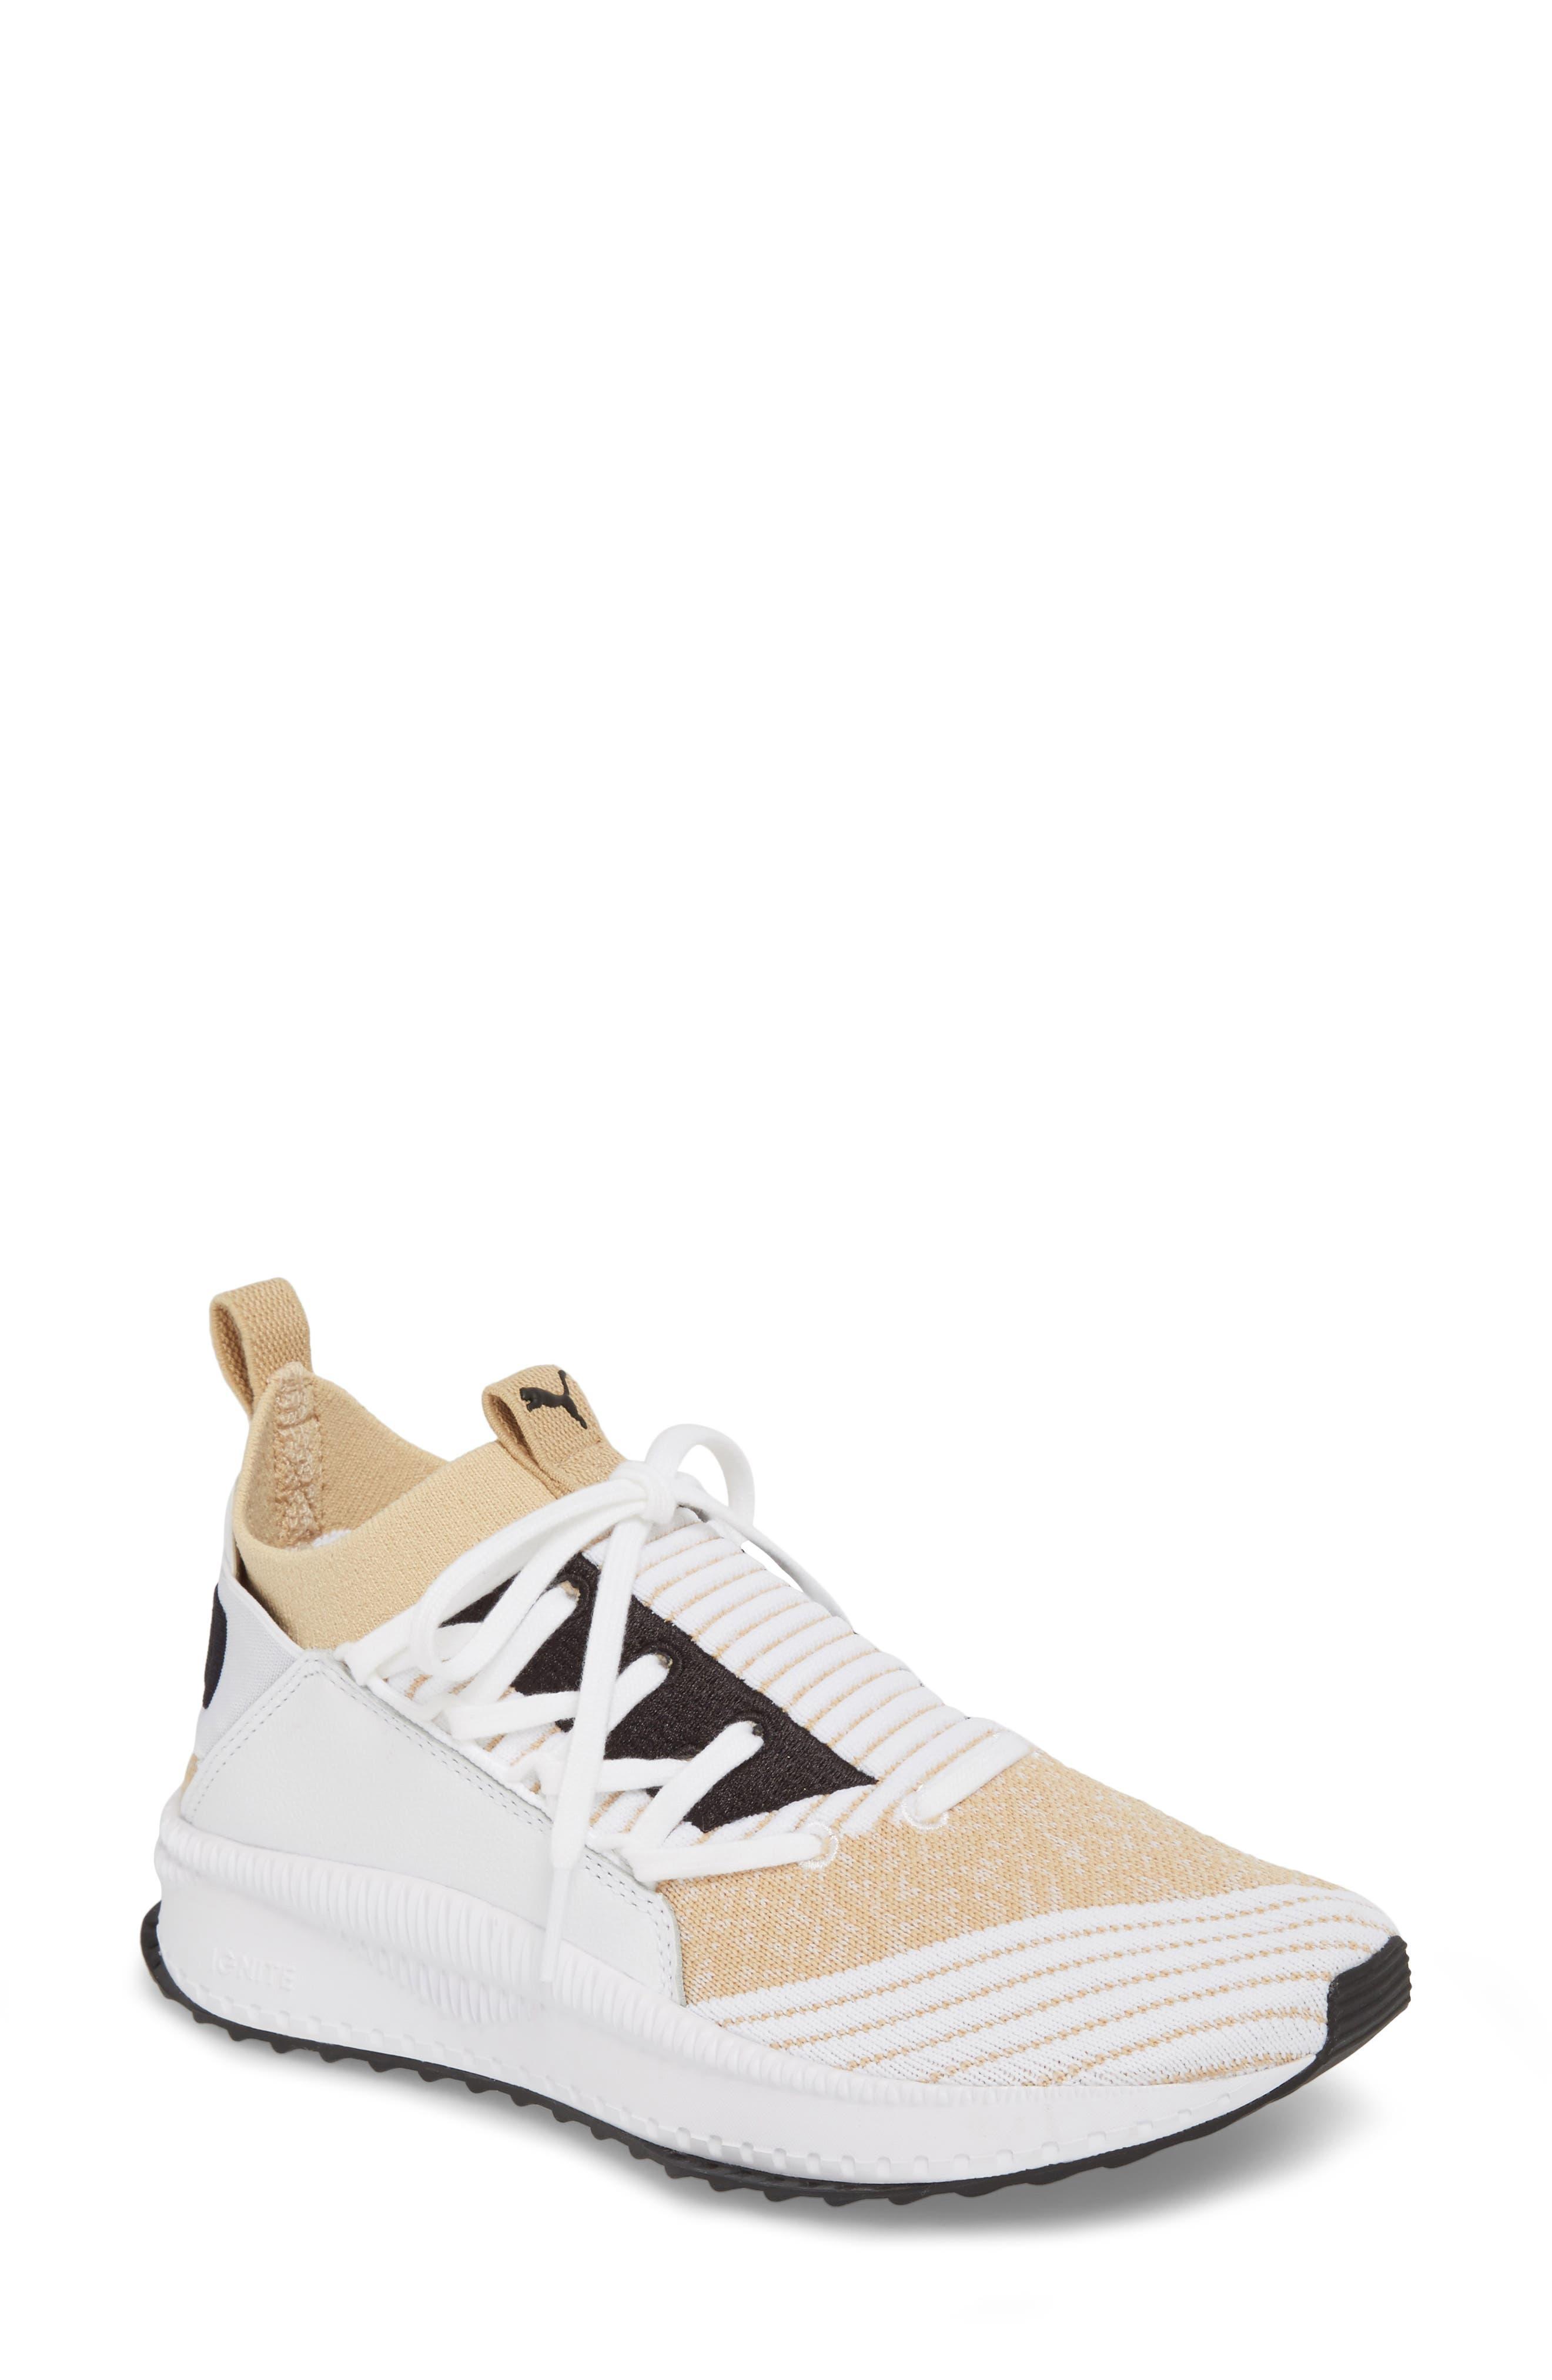 Tsugi Jun Knit Sneaker,                             Main thumbnail 4, color,